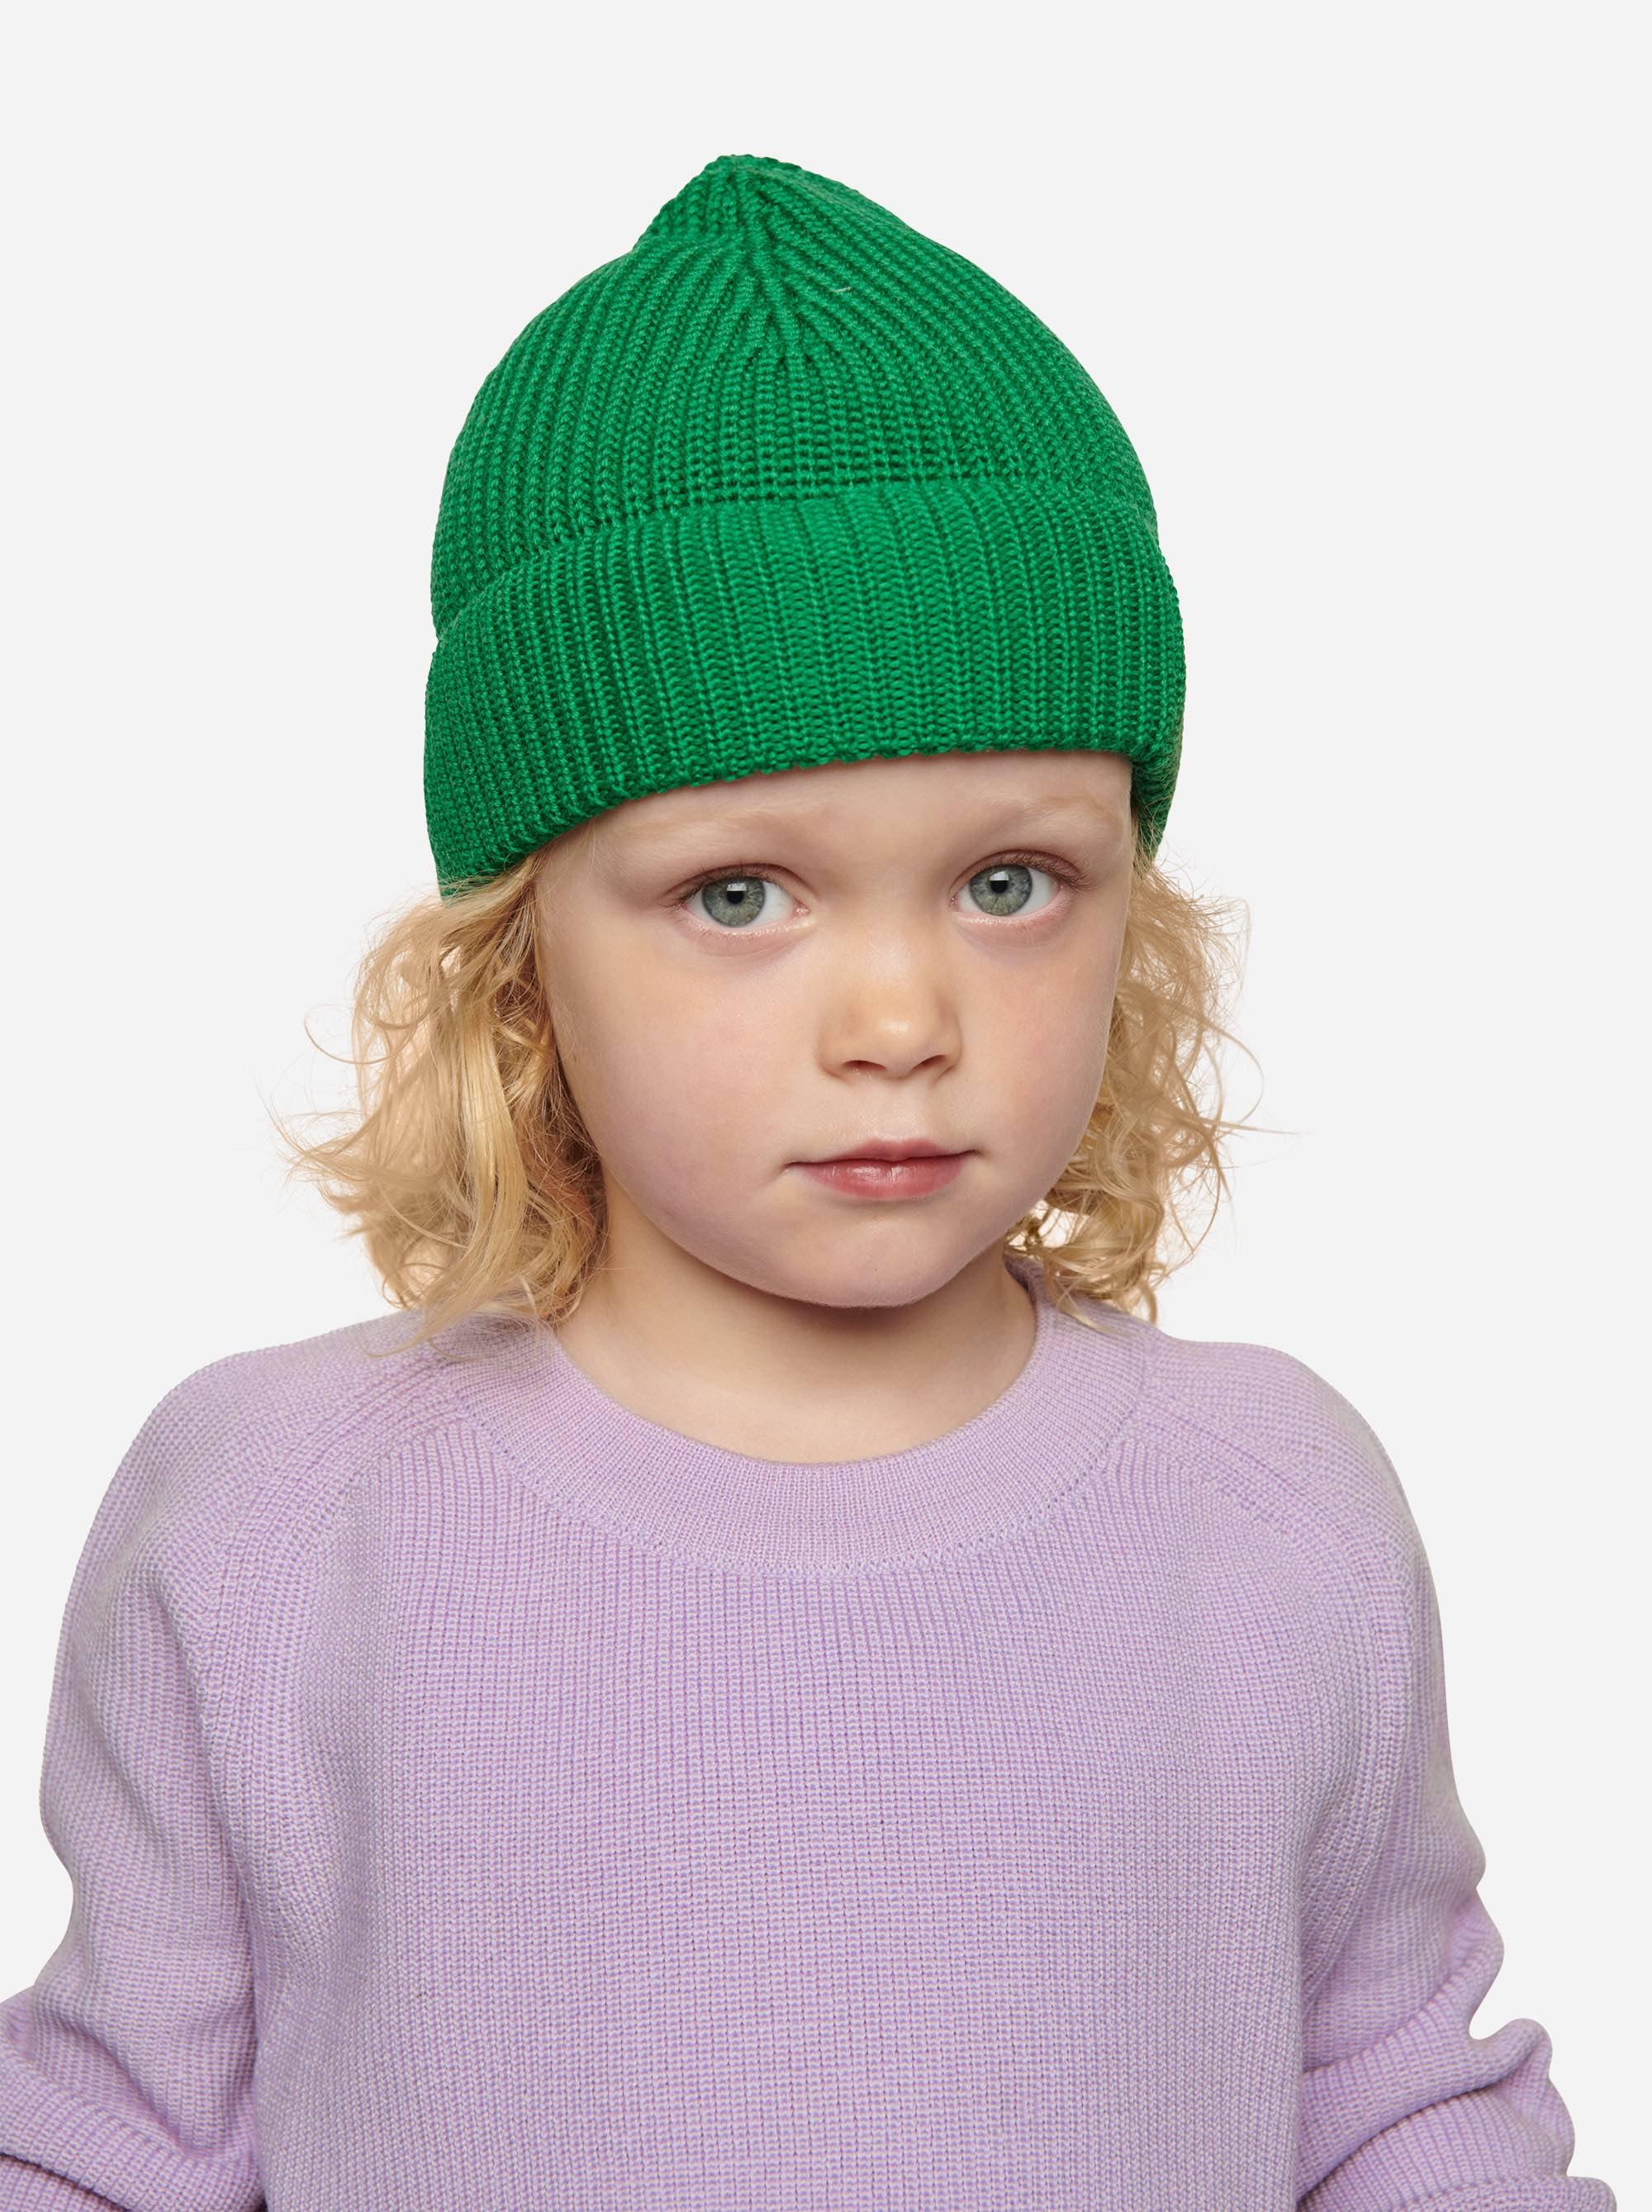 Mini_Beanie_0_4_Bright_Green